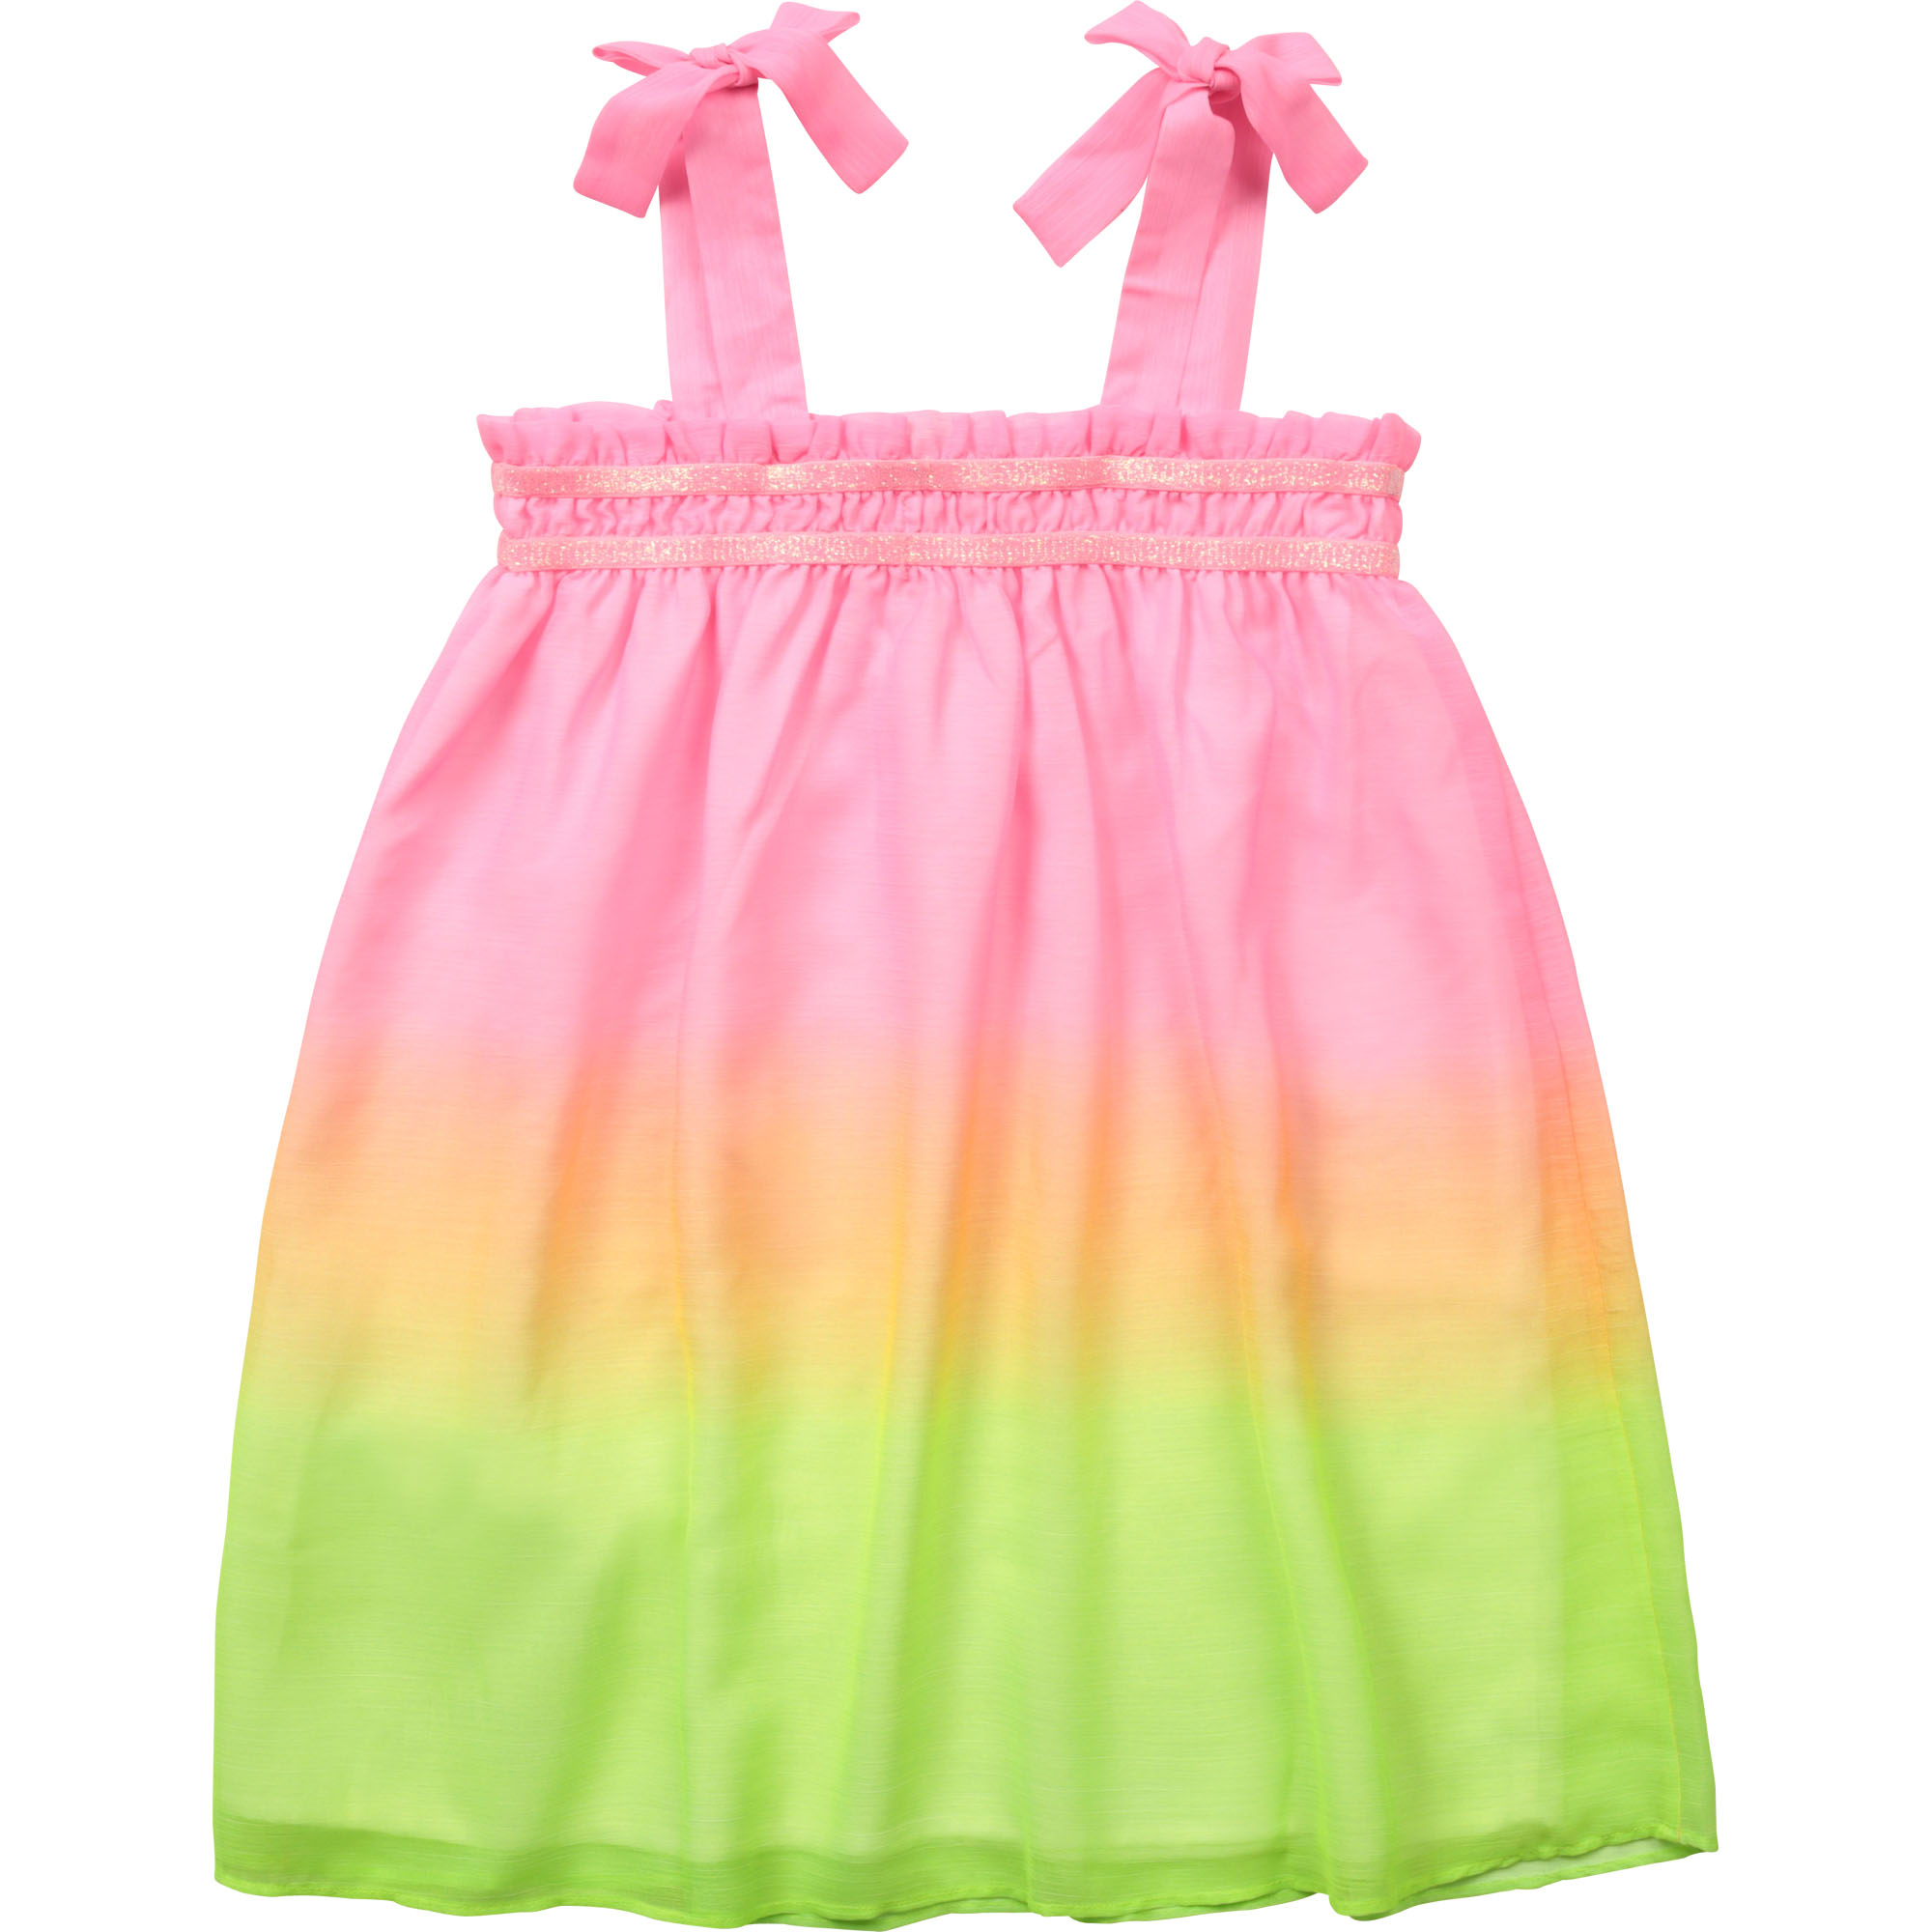 Muslin party dress BILLIEBLUSH for GIRL